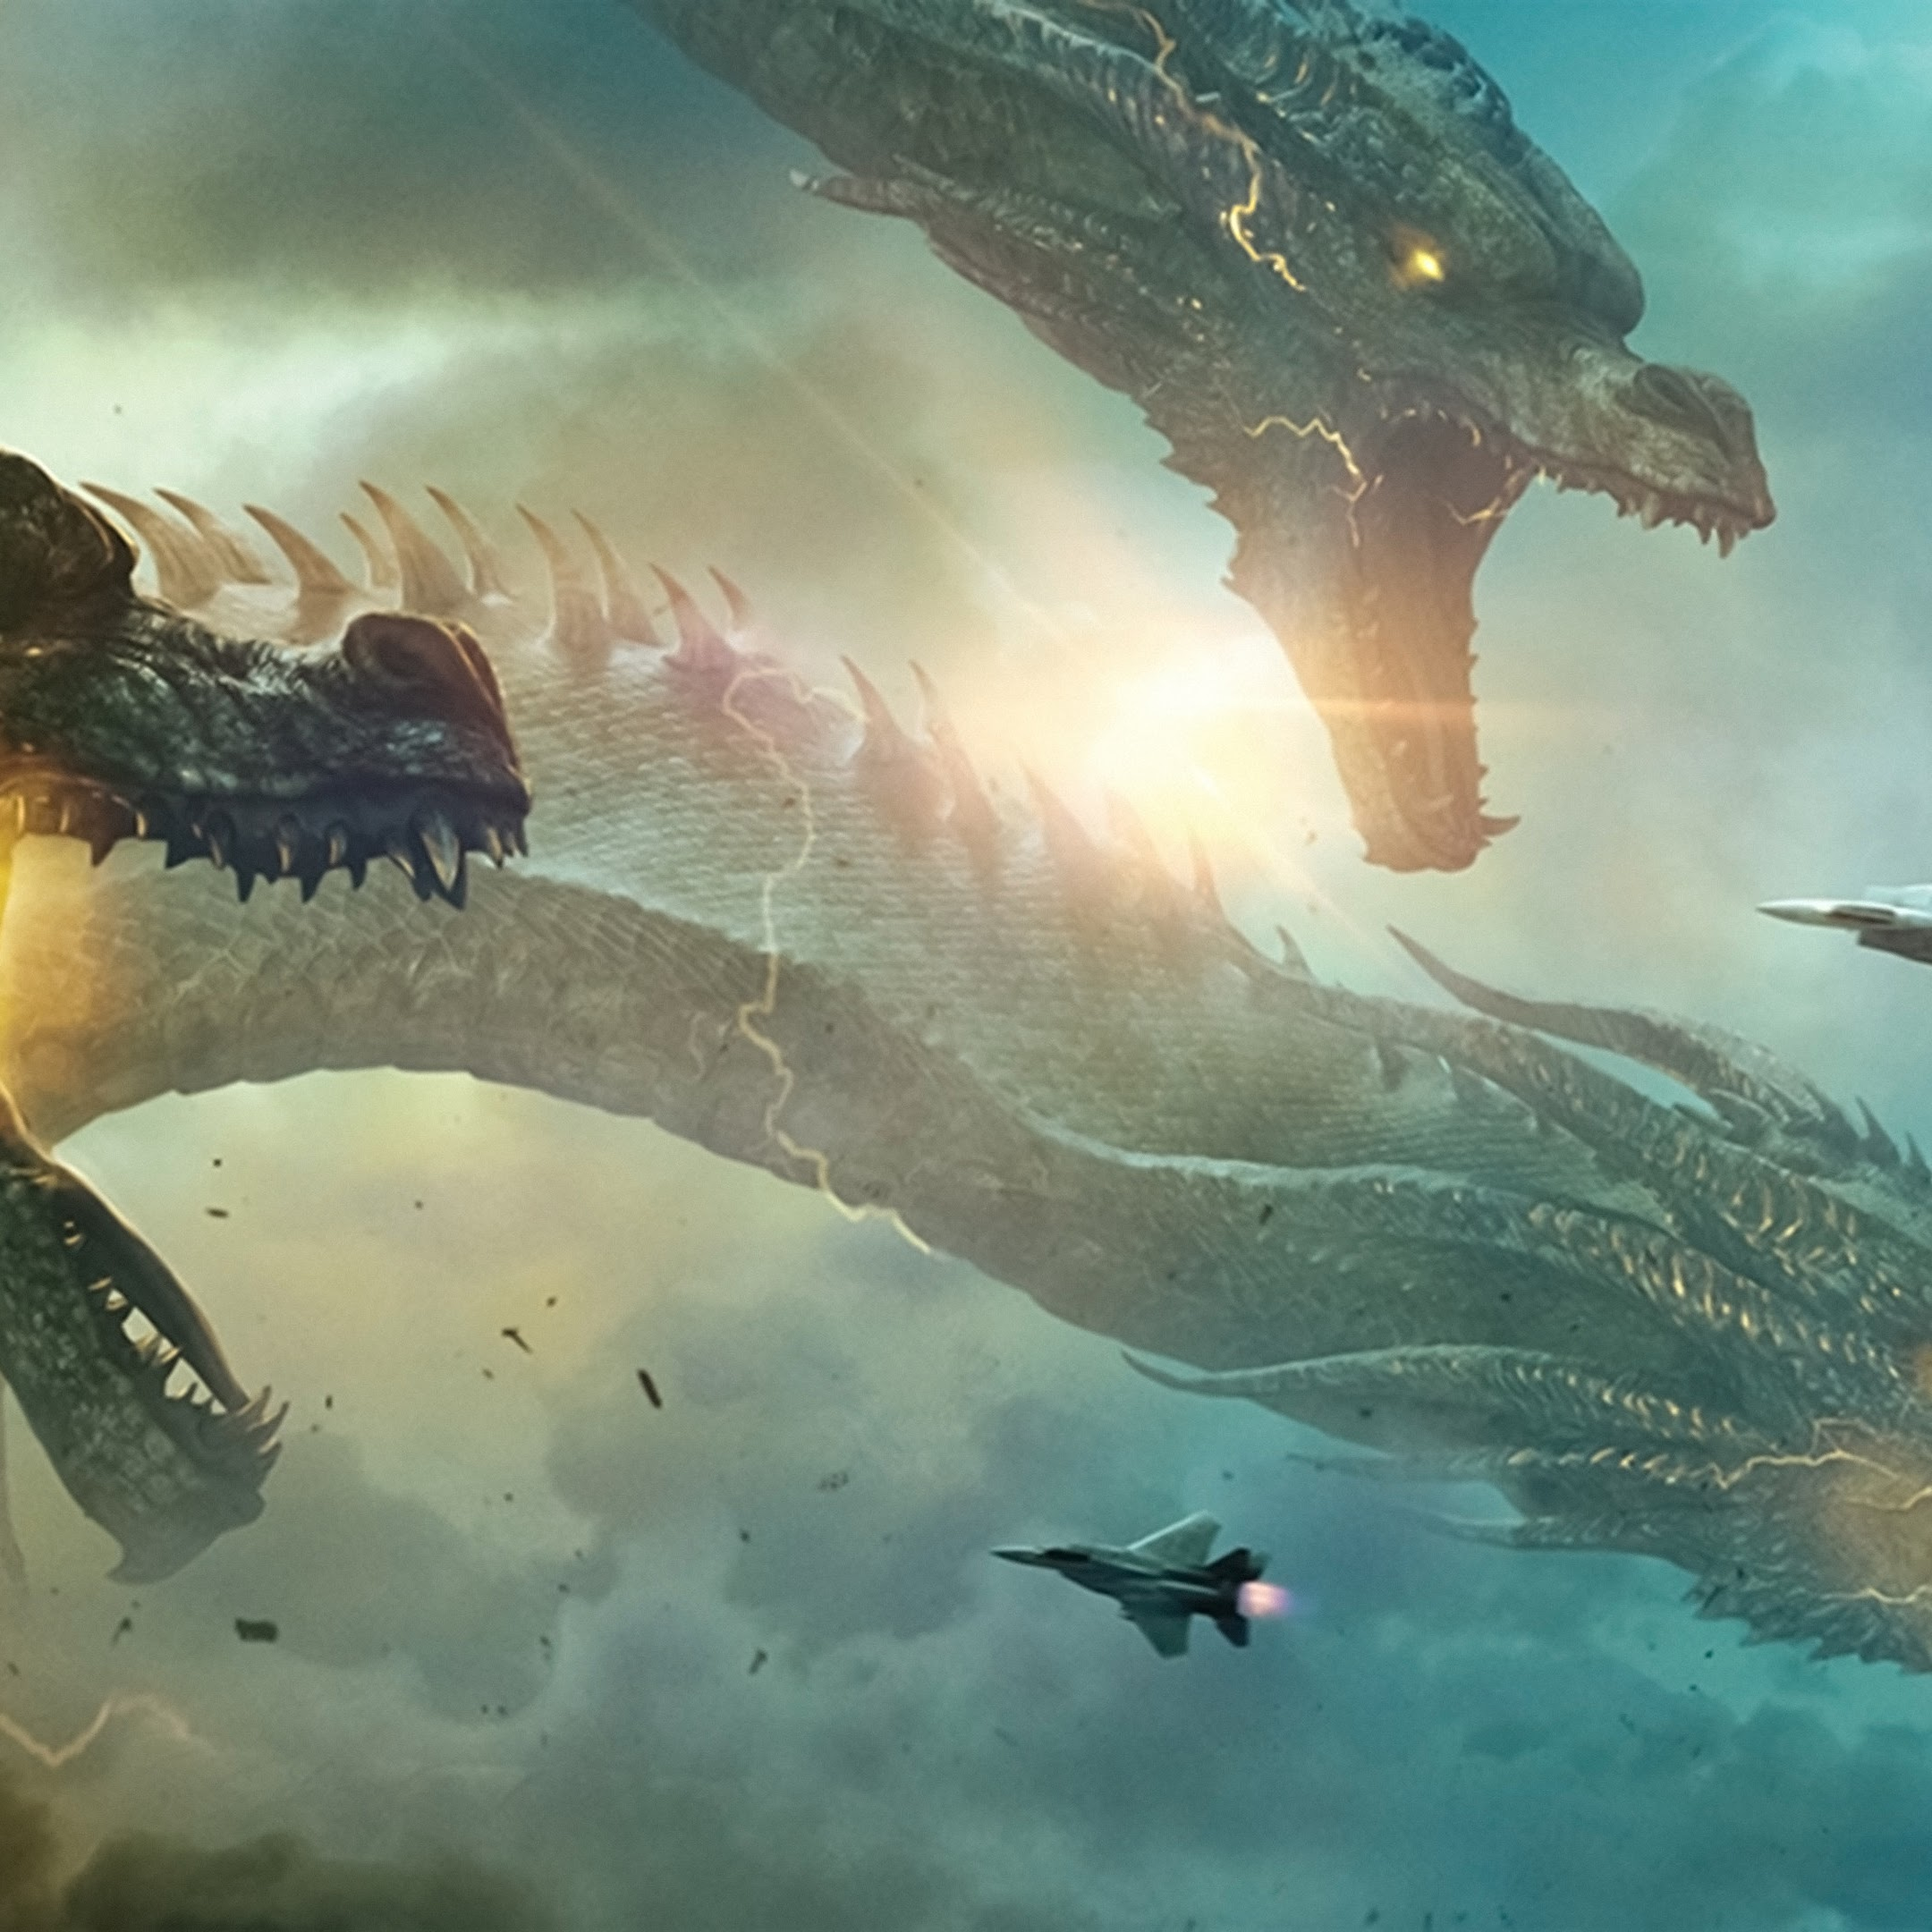 King Ghidorah, Godzilla: King Of The Monsters, 4K, #19